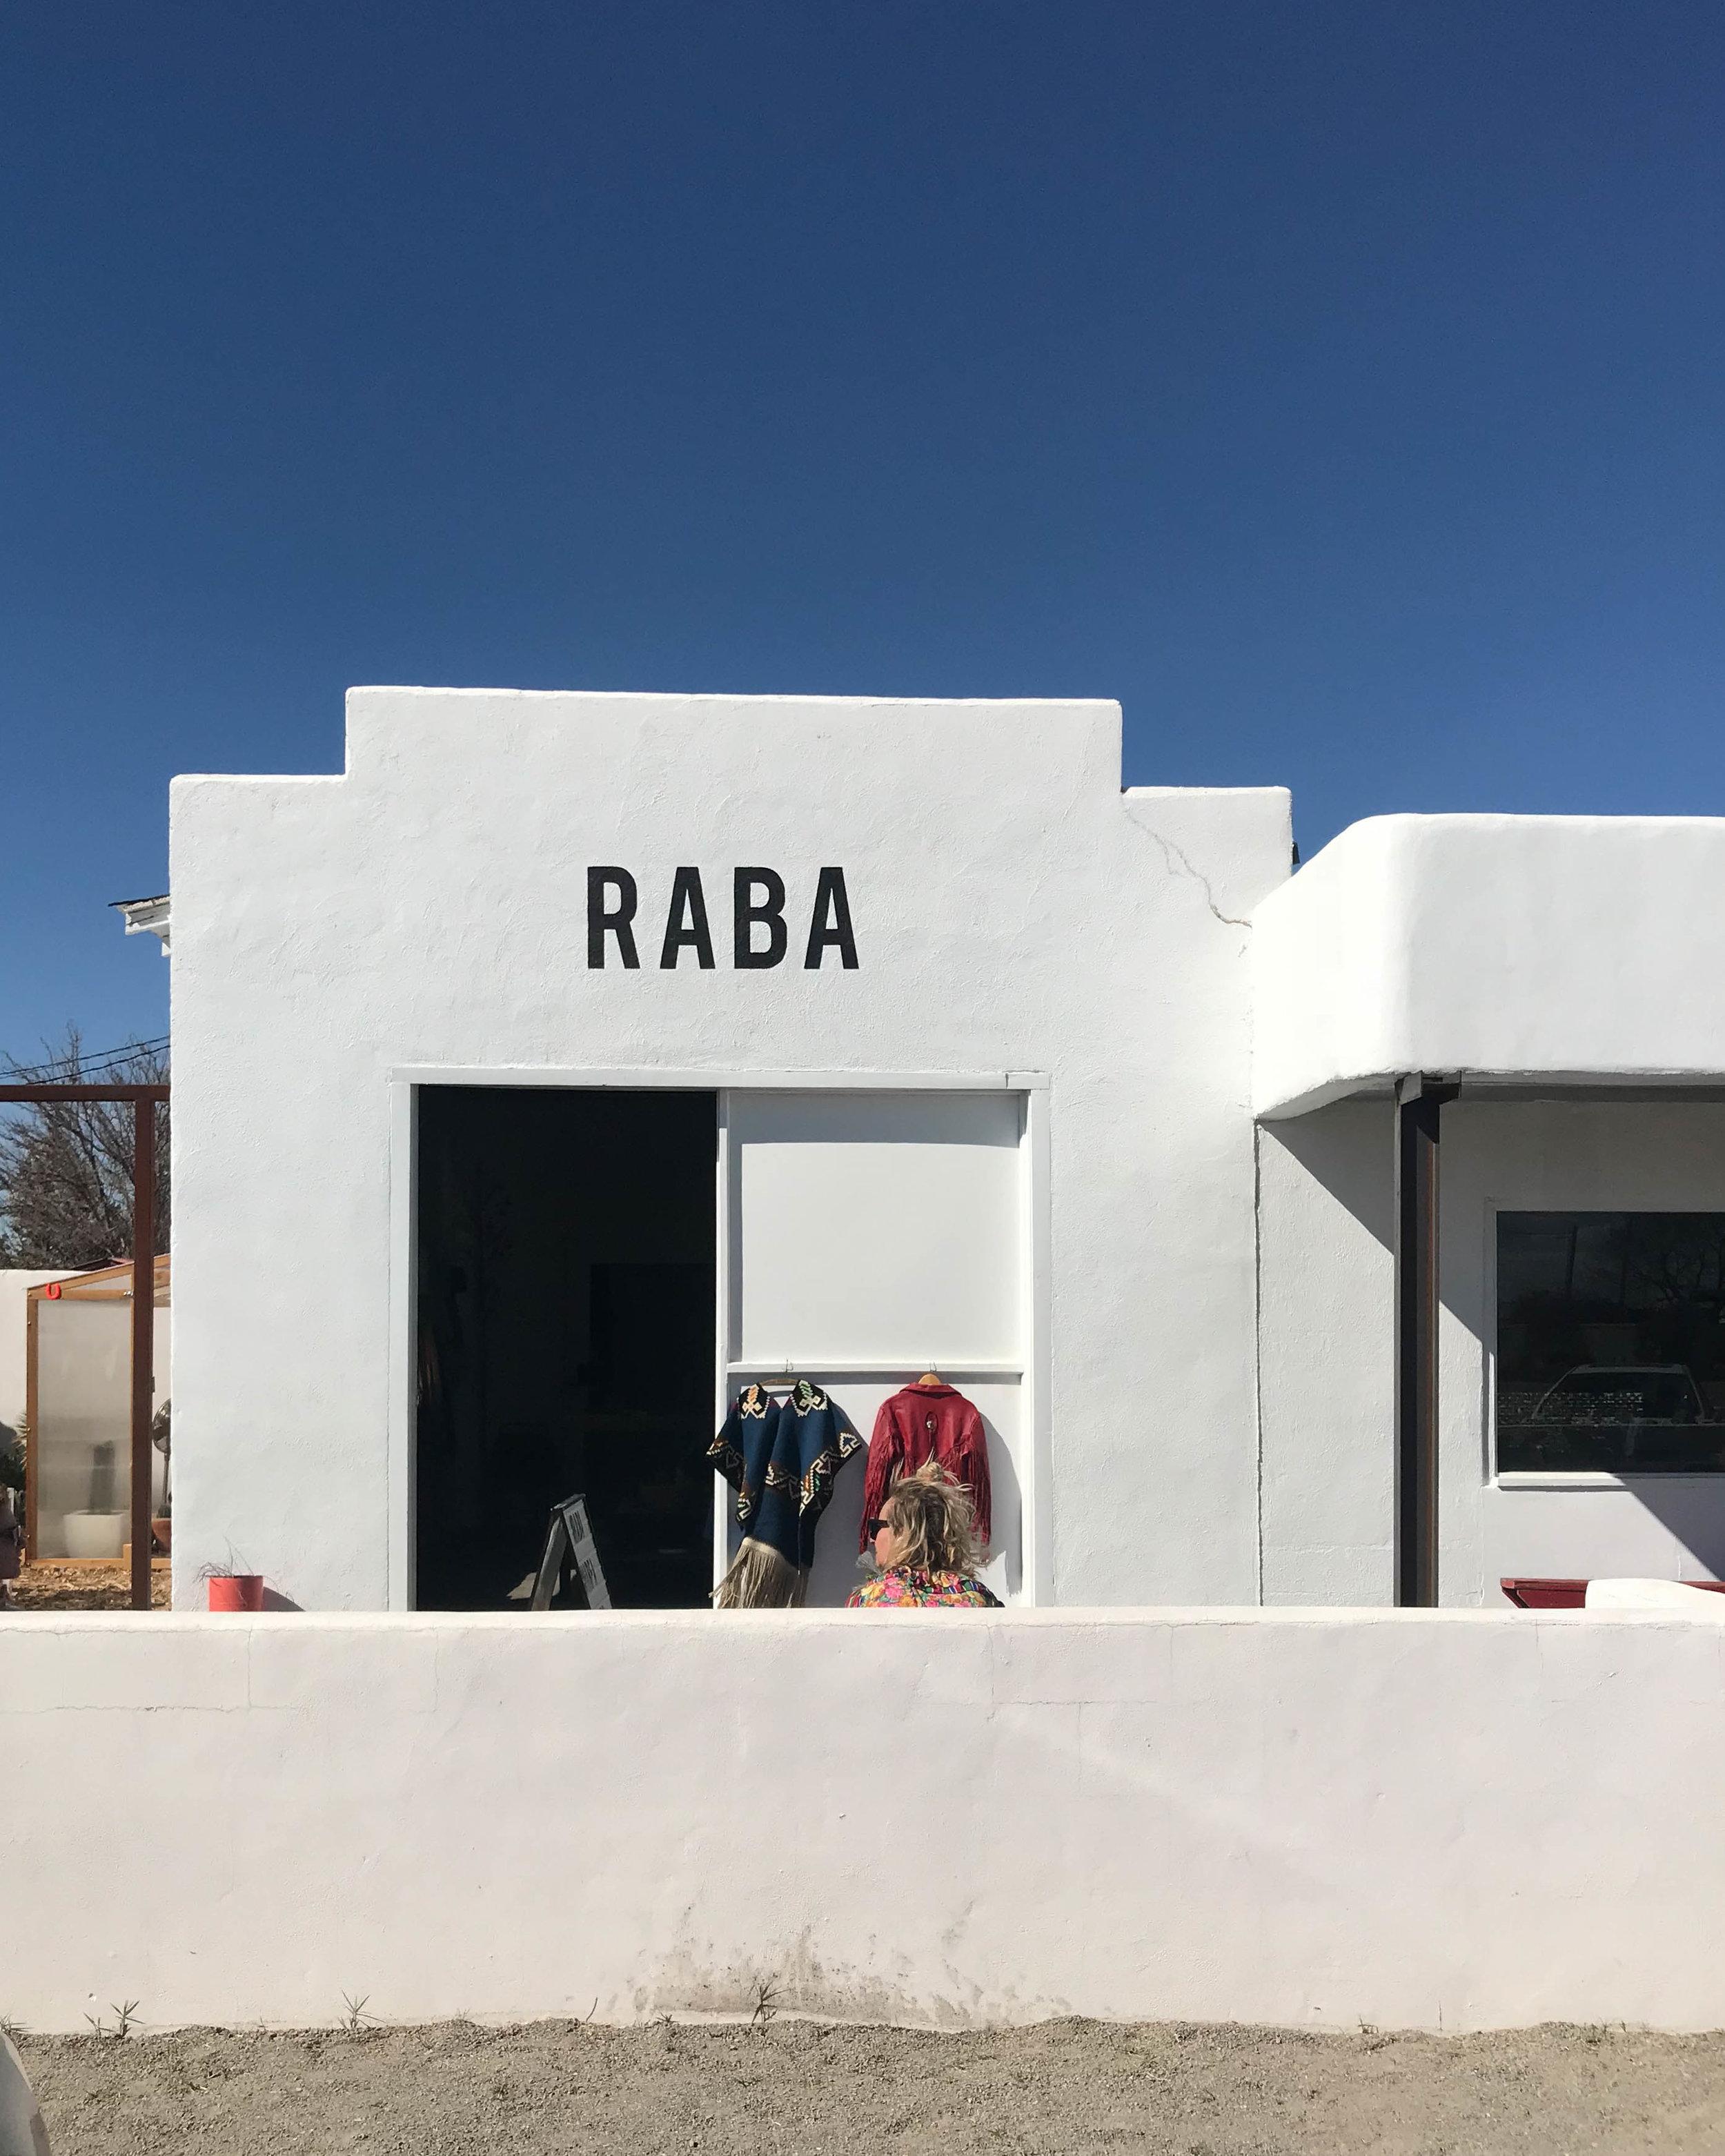 Raba Vintage Clothing